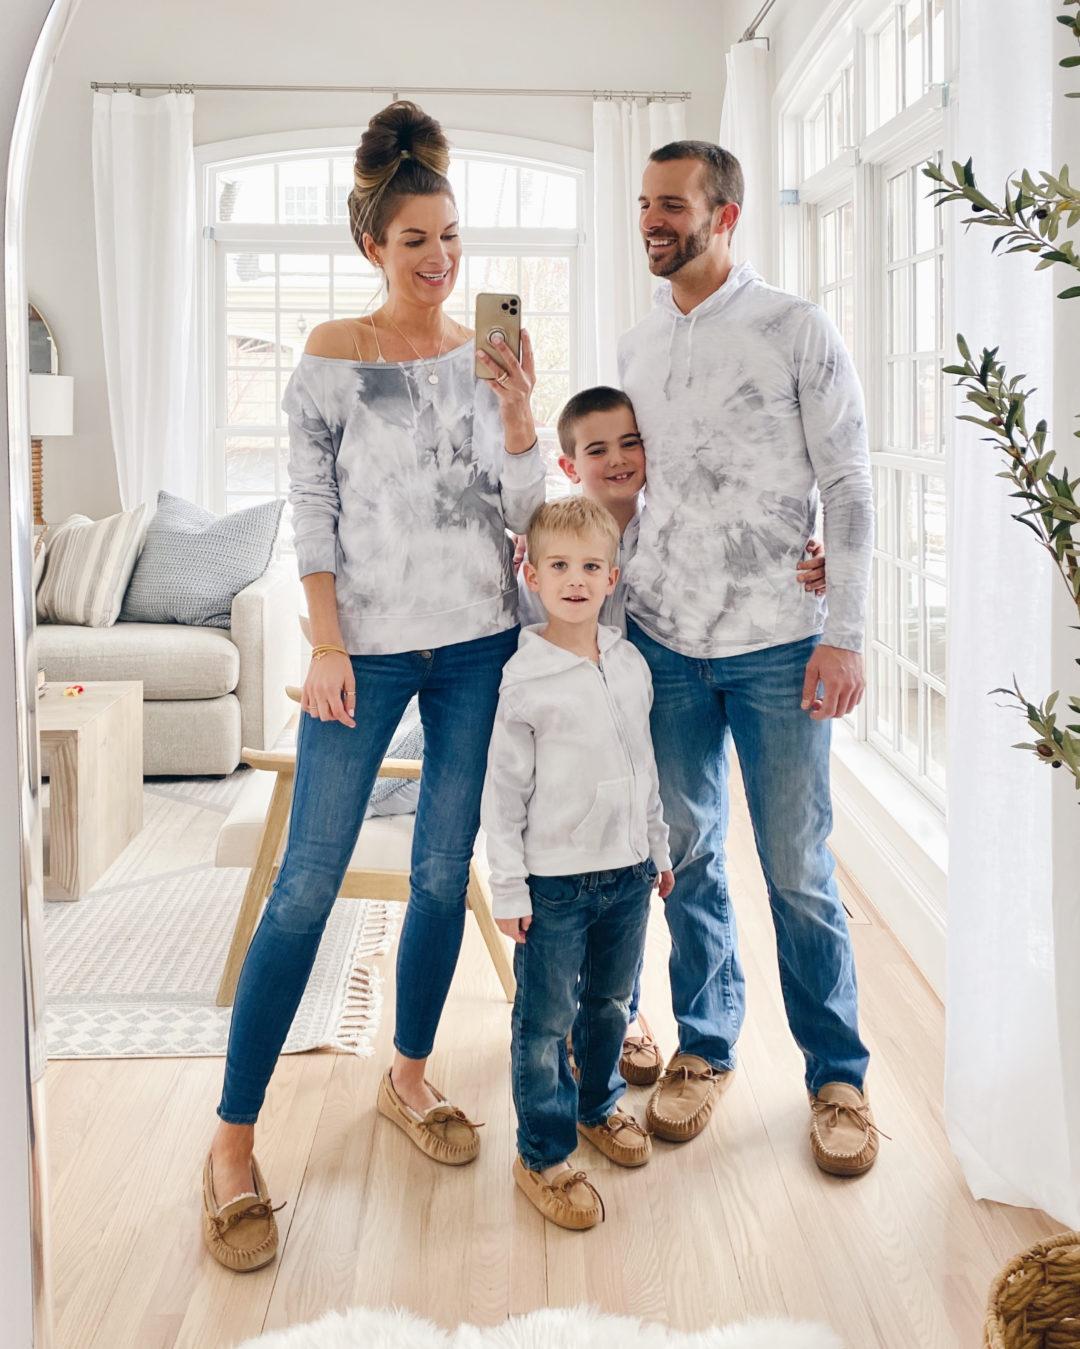 quarantine activities for kids - family tie dye